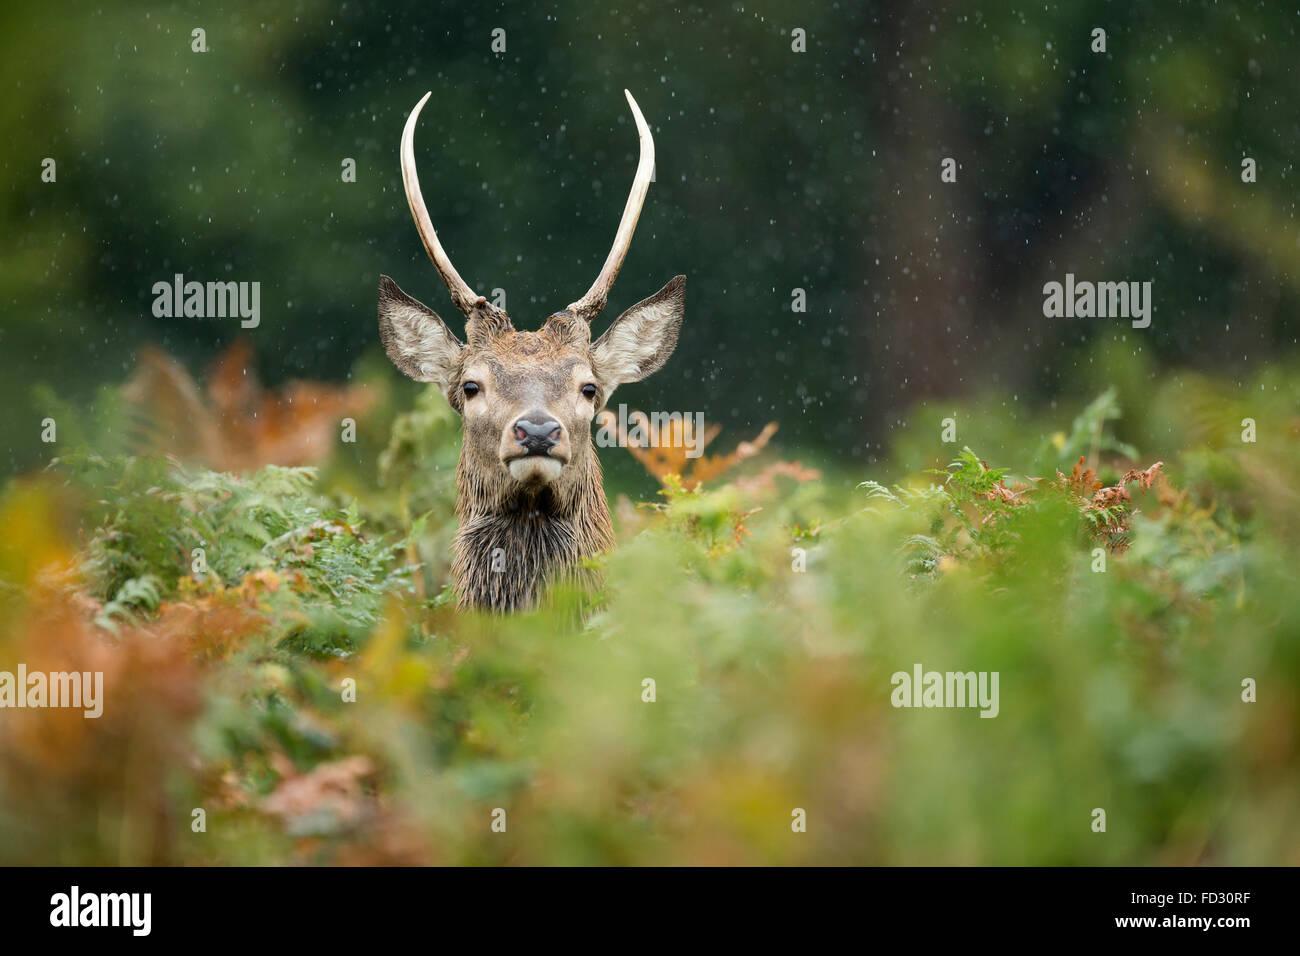 Young red deer (Cervus elaphus) stag amongst bracken in rain during the rutting season - Stock Image